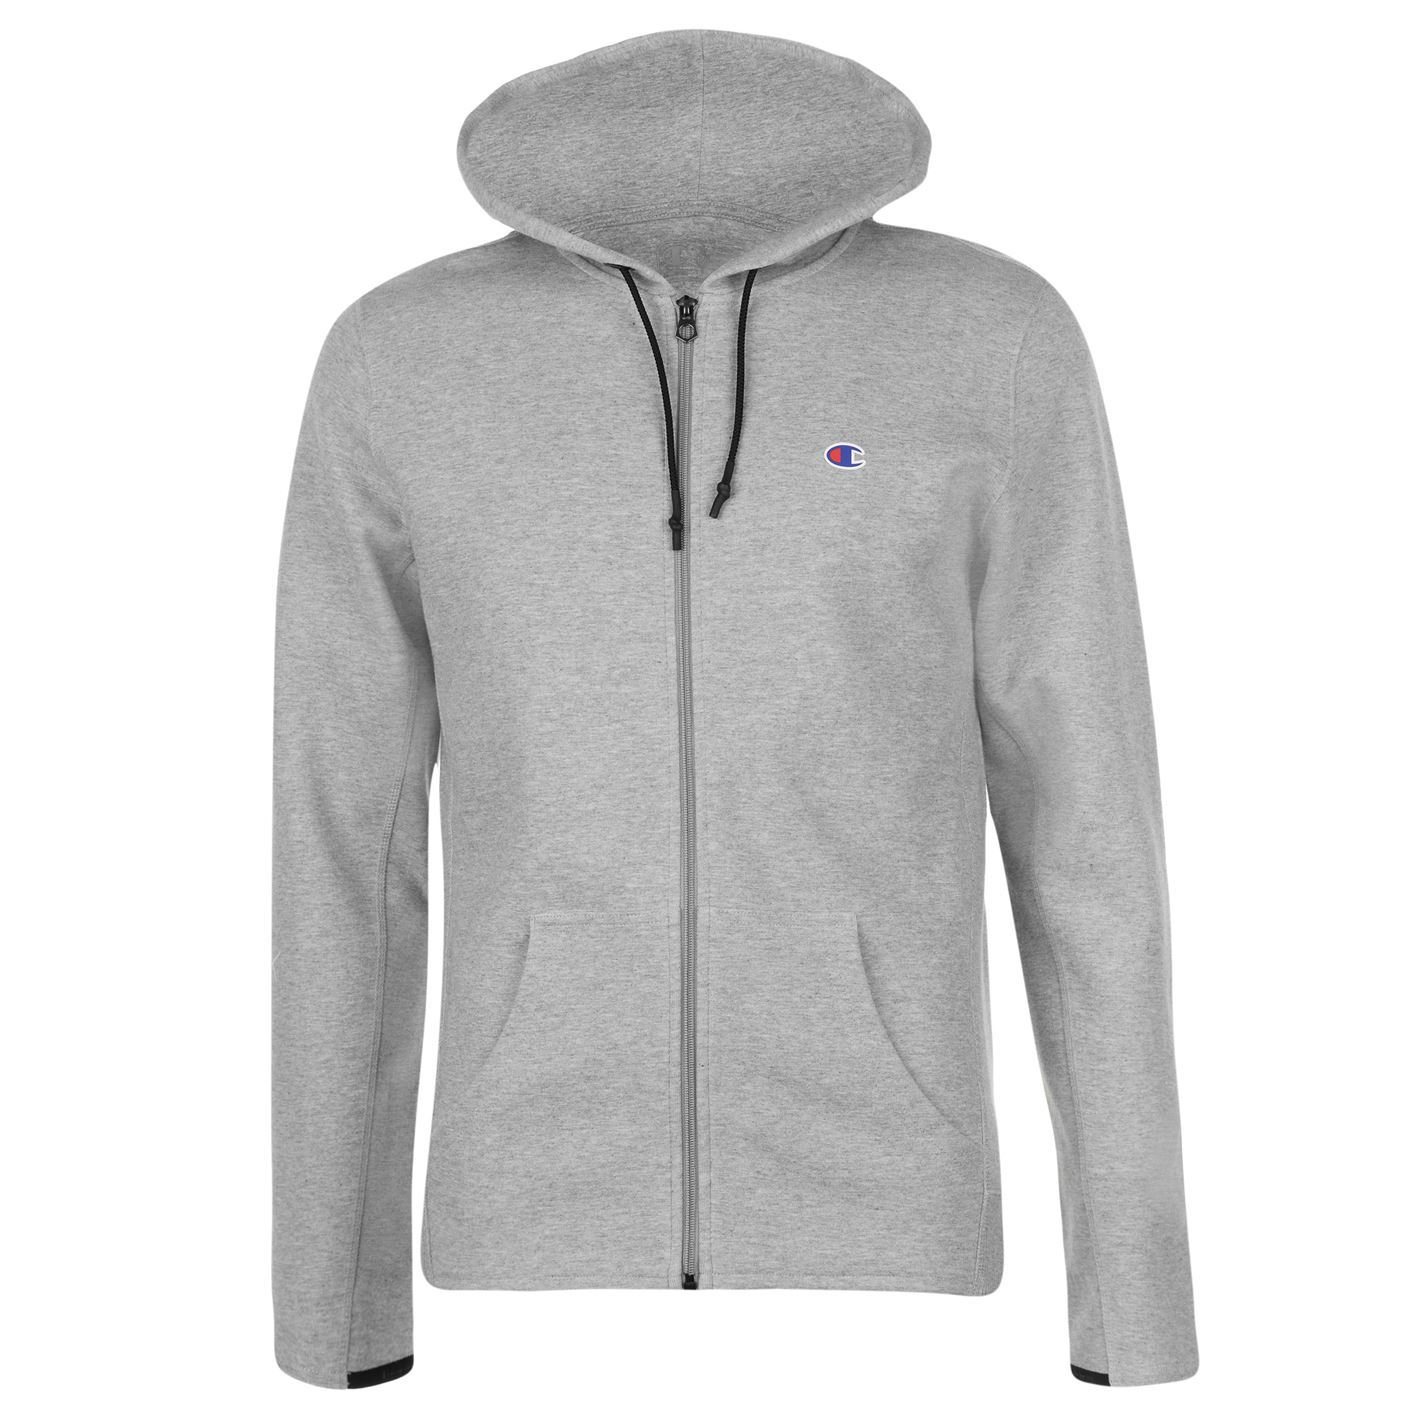 Champion-Interlock-Full-Zip-Hoody-Mens-Hoodie-Top-Sweatshirt-Sweater thumbnail 11